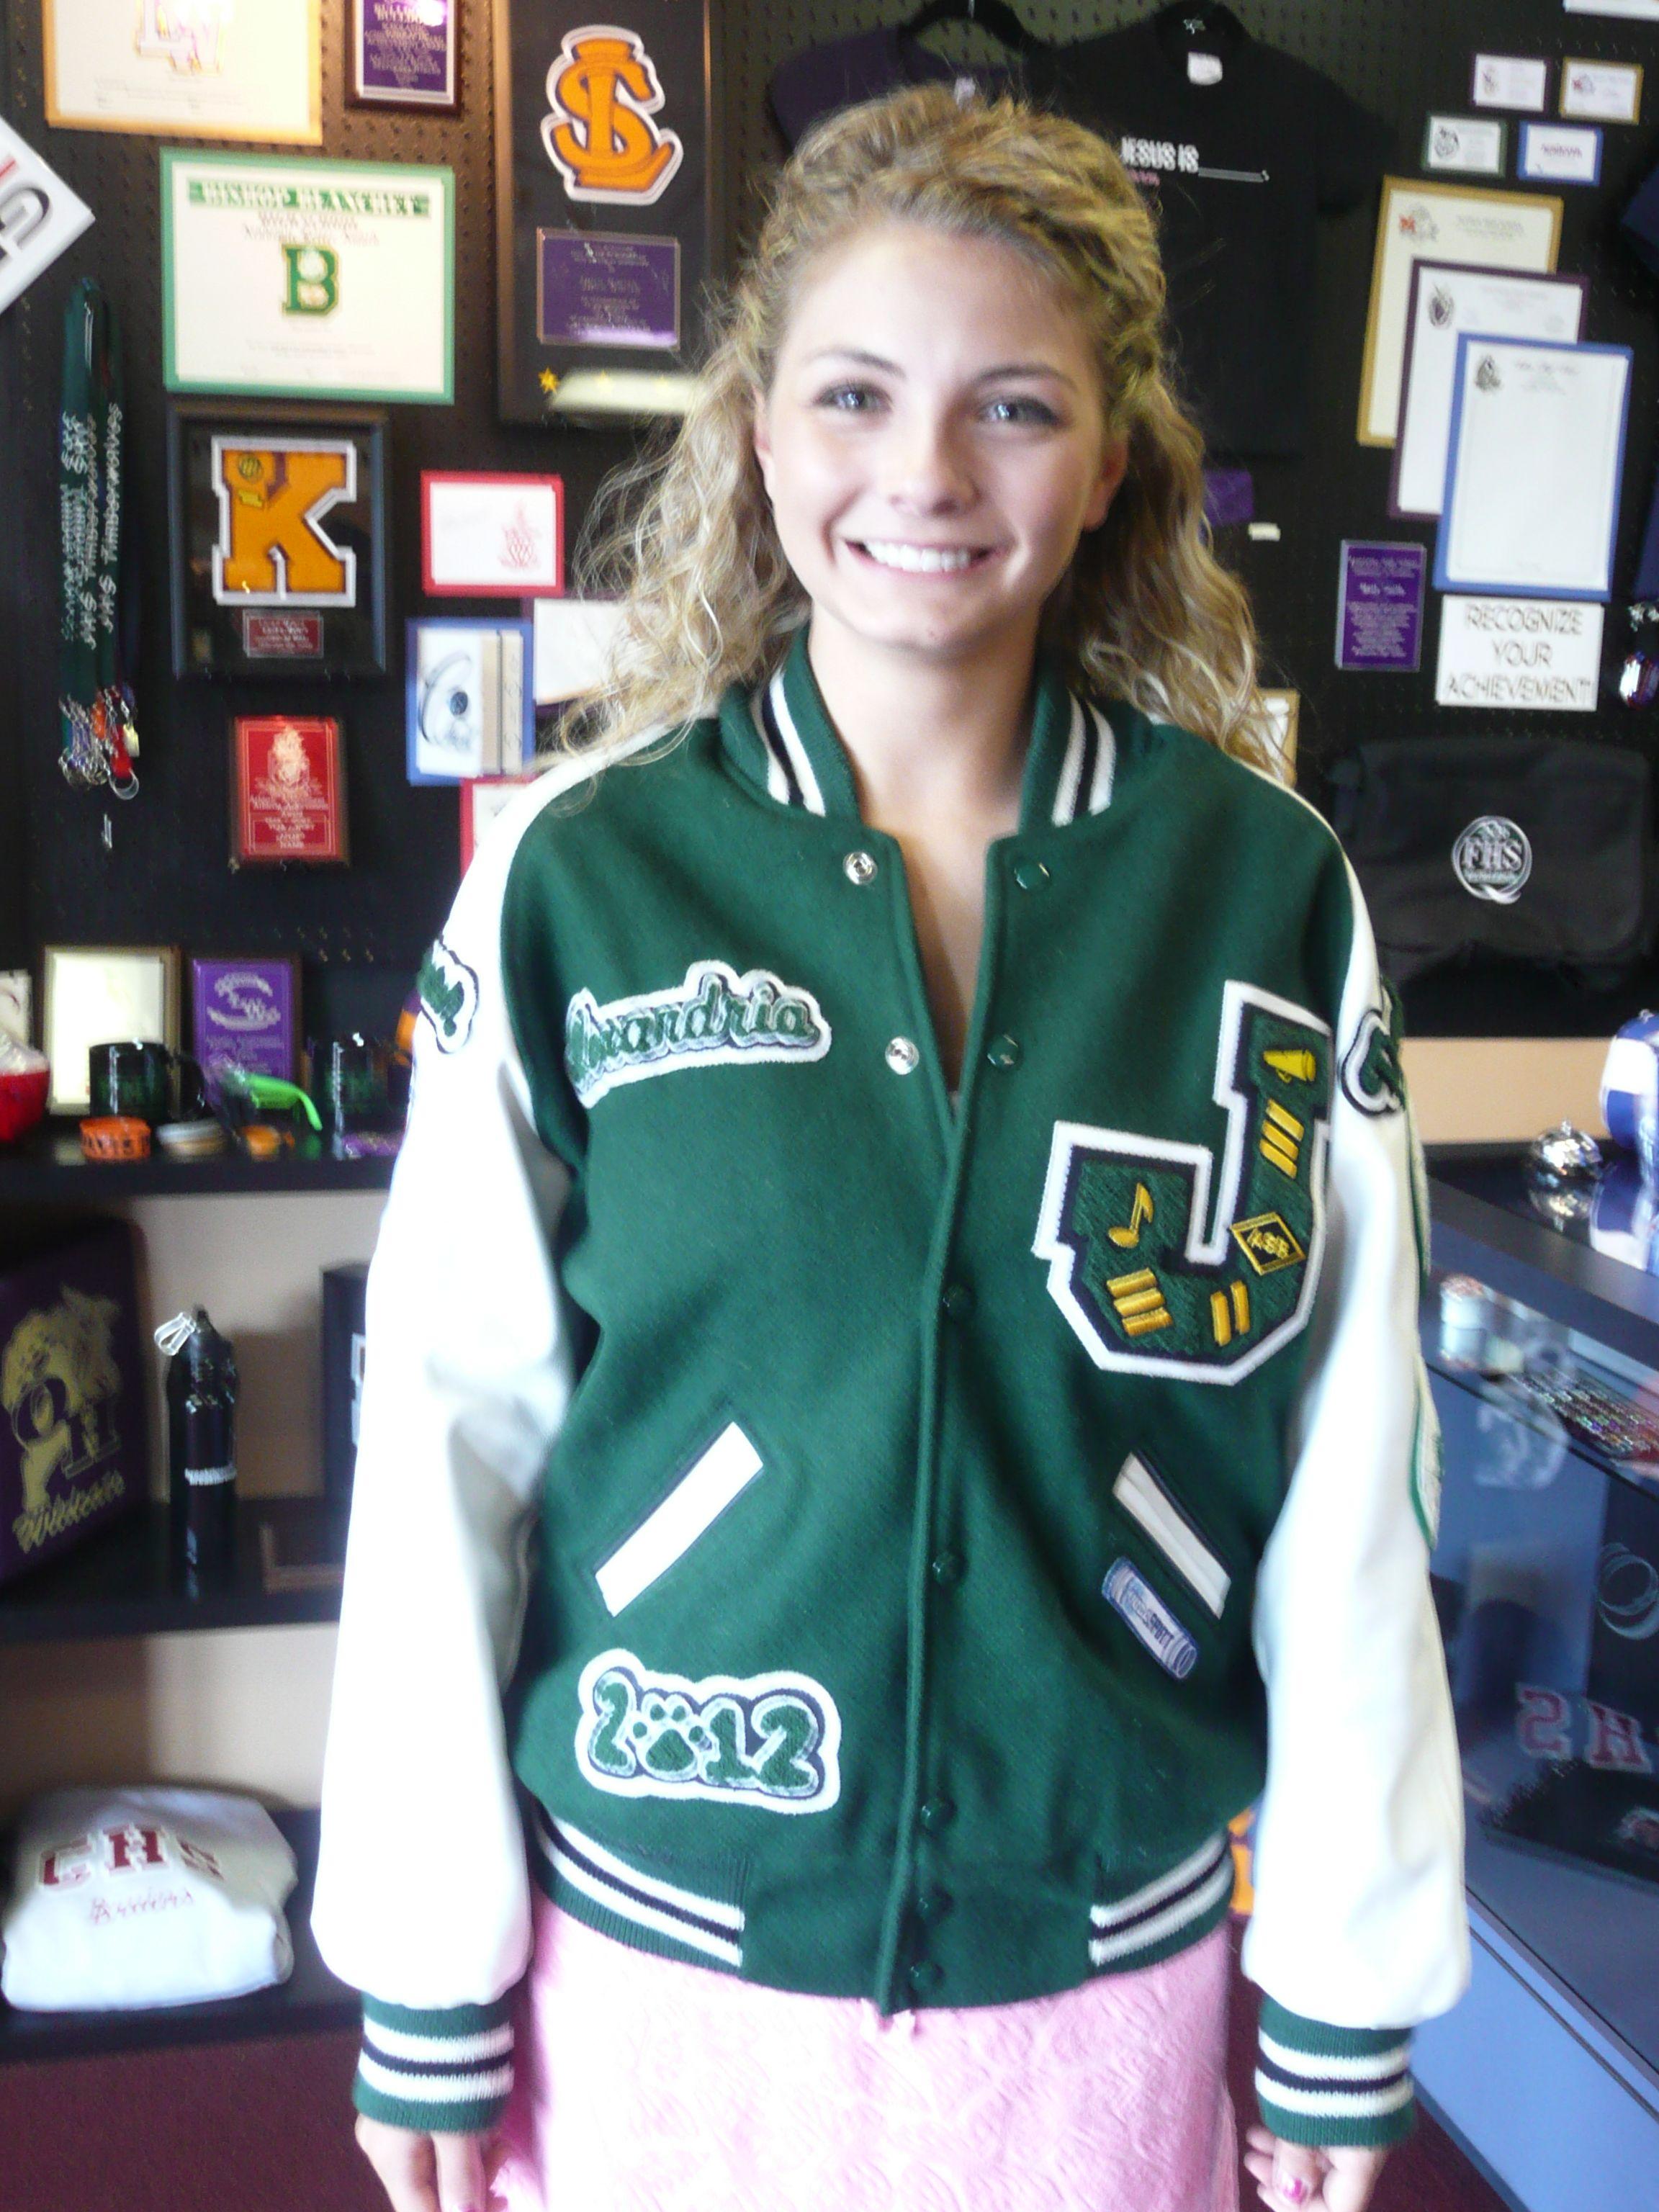 Beautiful Green Girls Varsity Jacket | Letterman Jackets ...